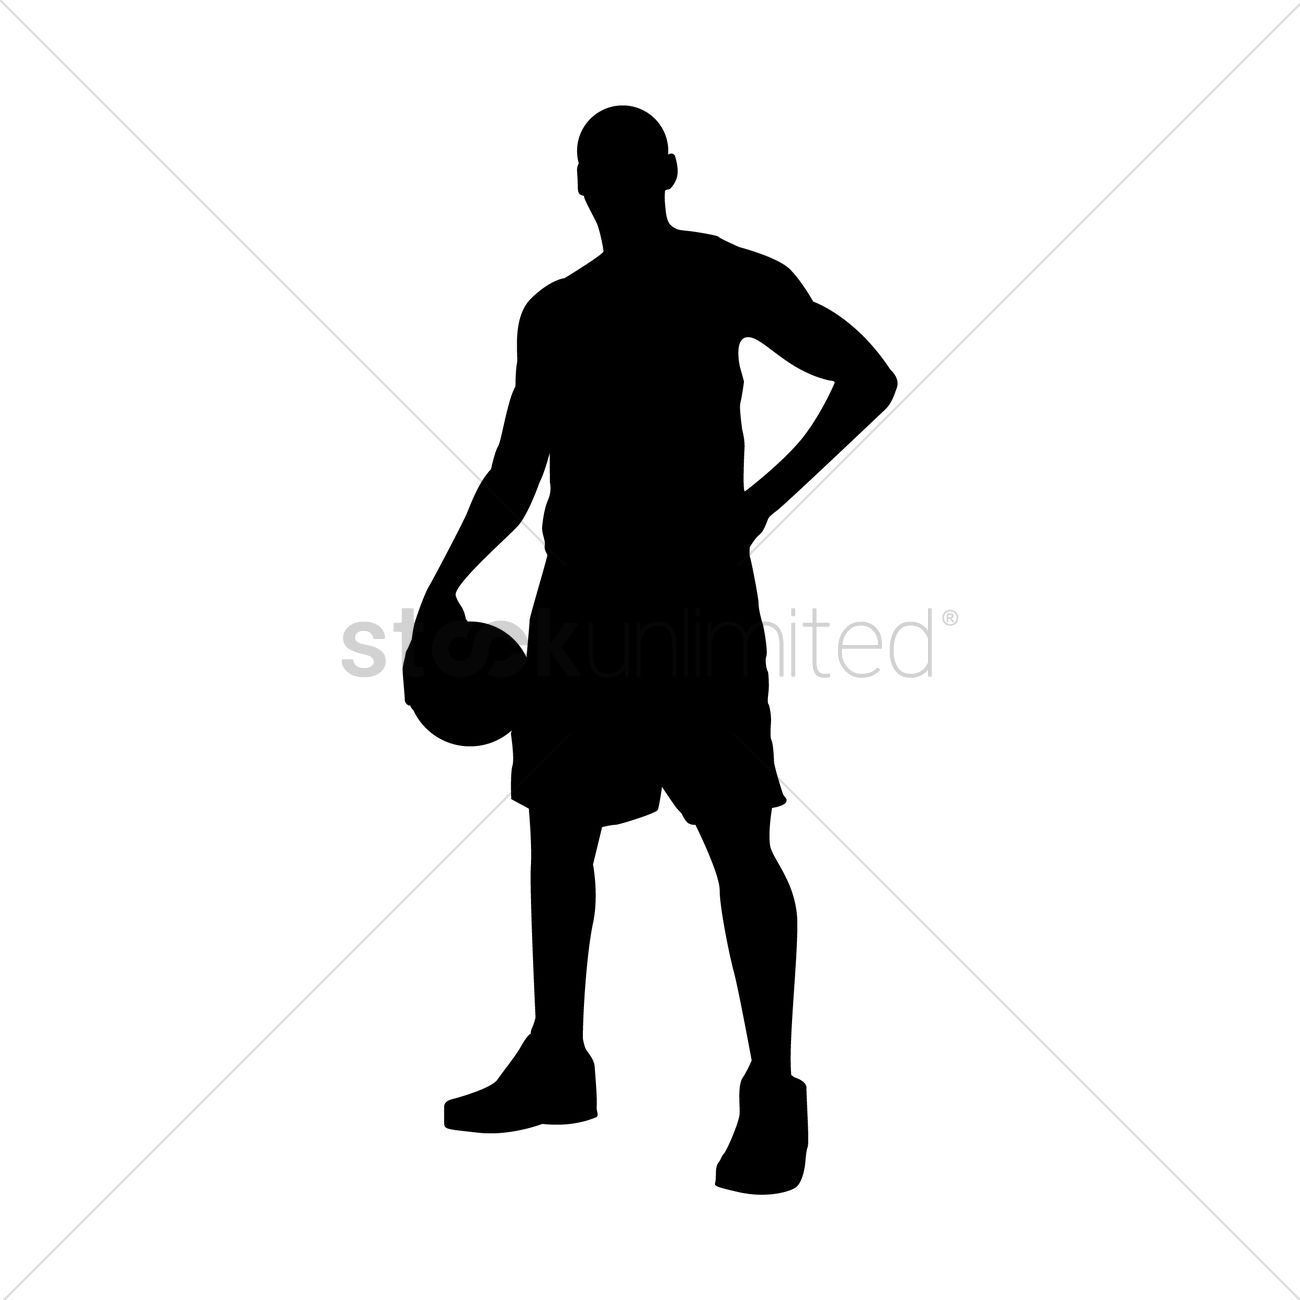 1300x1300 Basketball Player Standing Vector Image